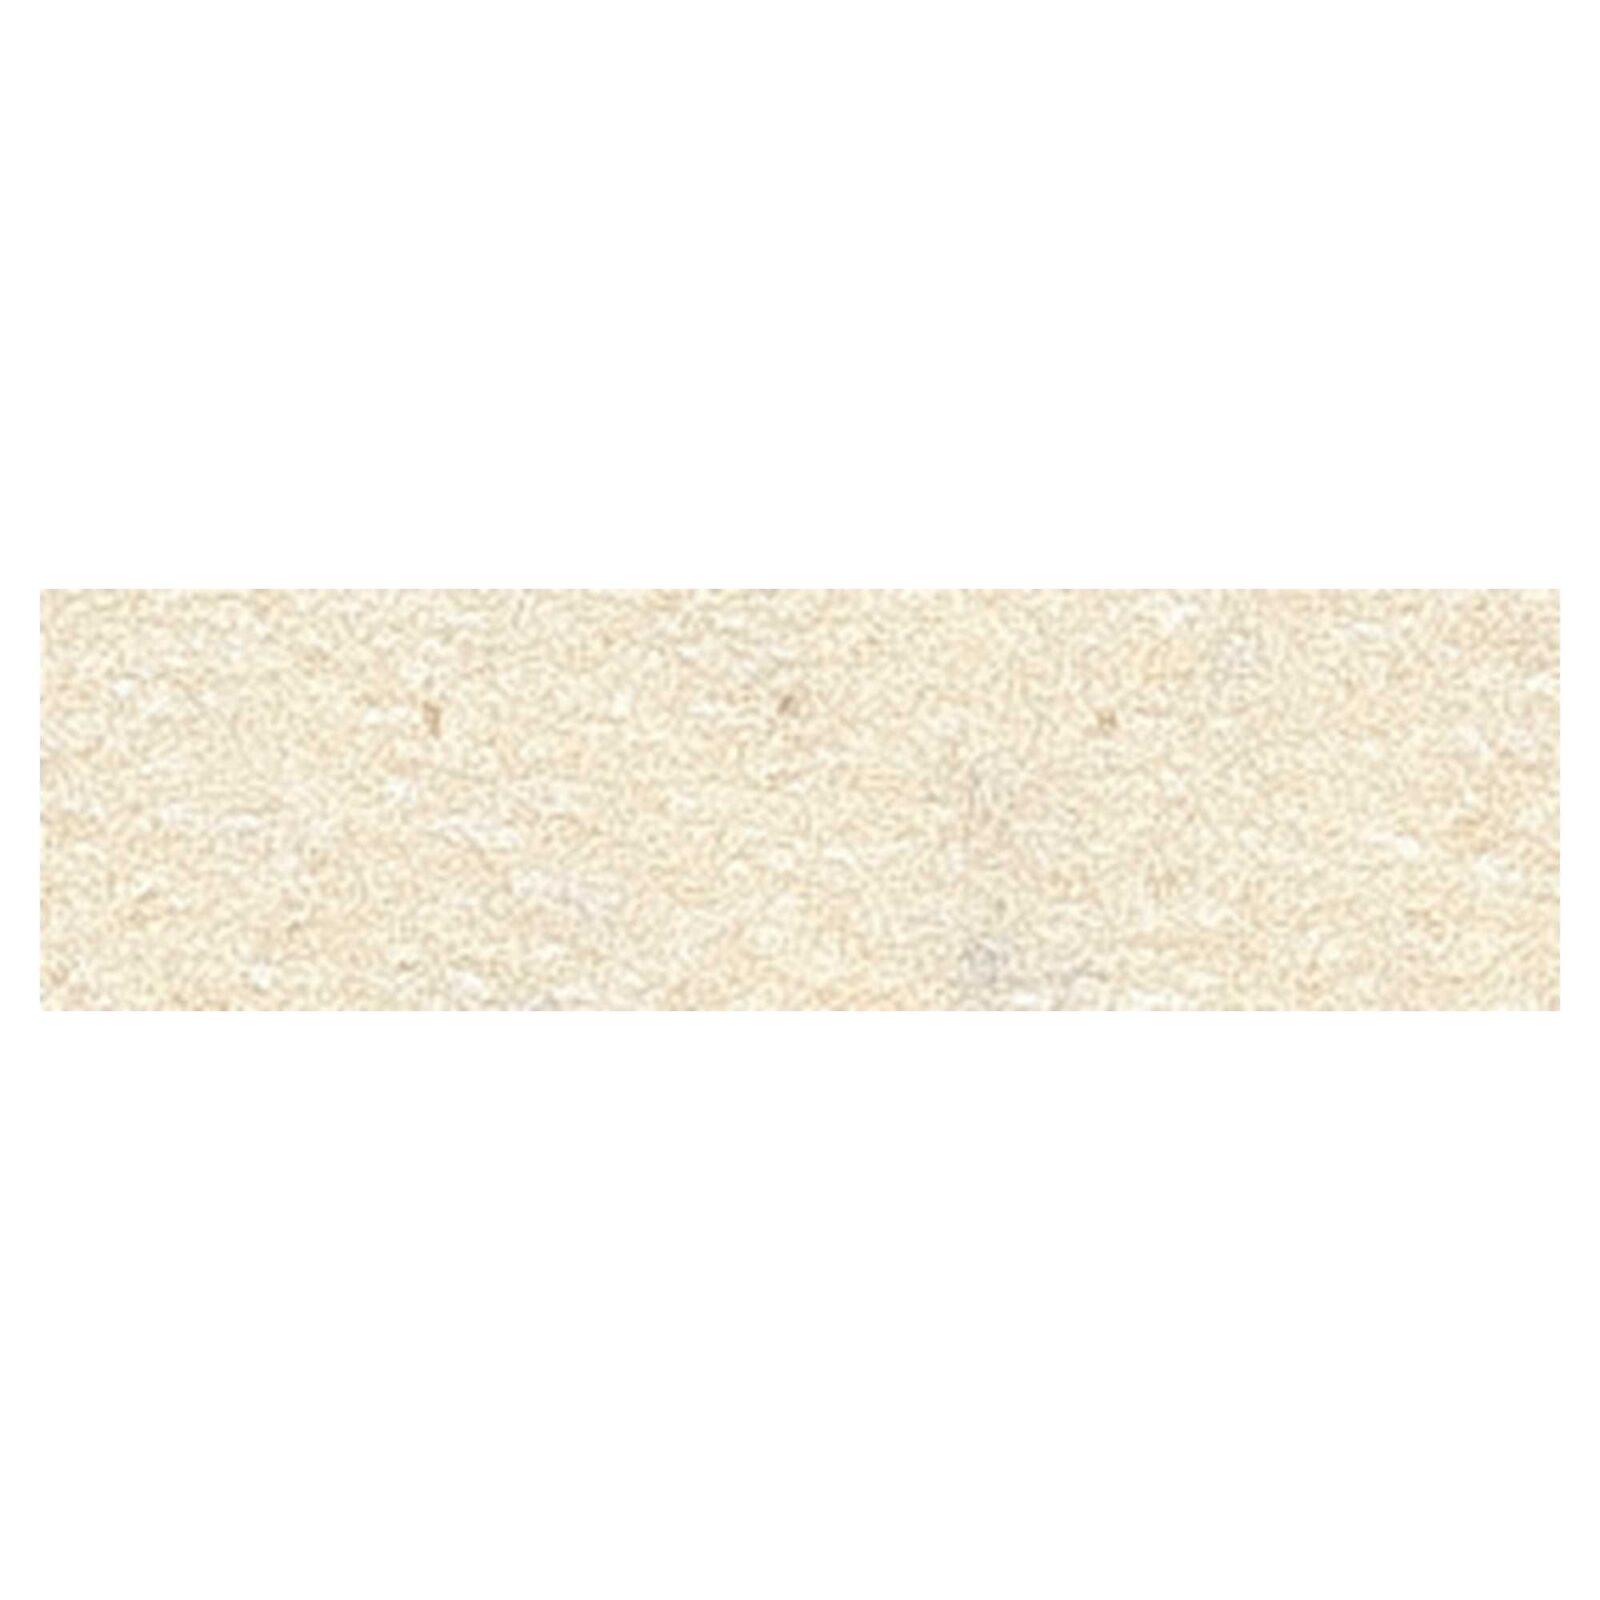 Мойка G-5(жасмин) (800х485х180) из гранитной крошки+сифон